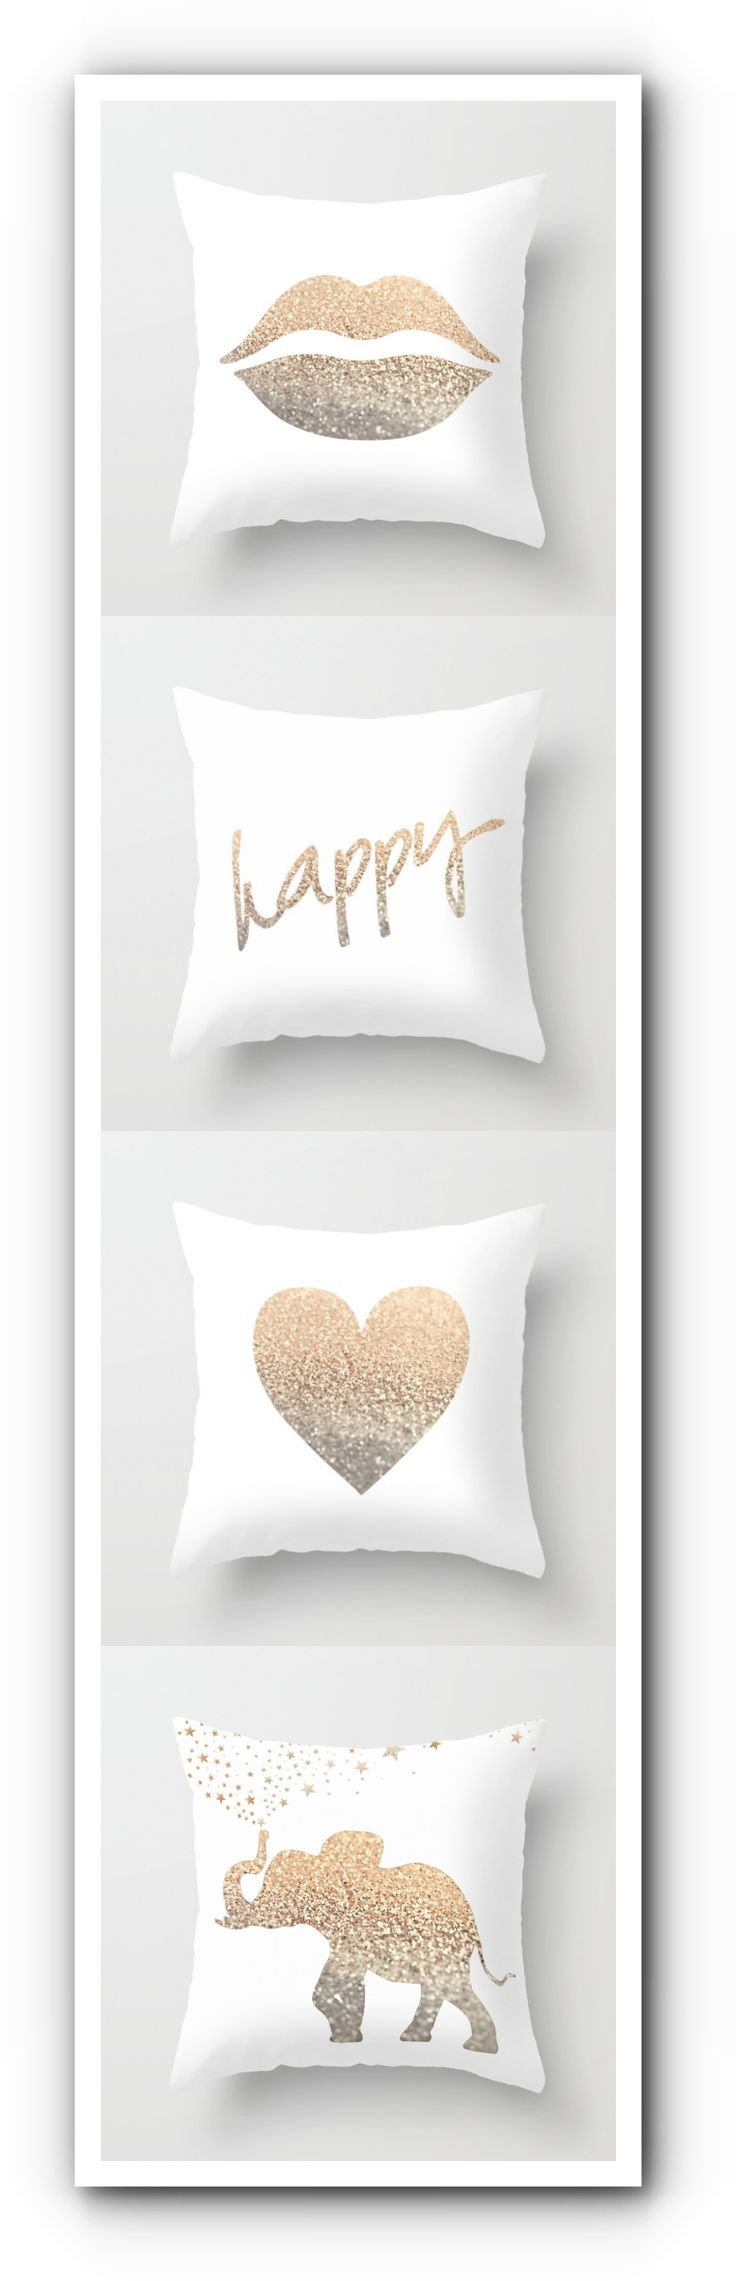 Cute ... cute .... cute ! I want them all! Starting $20 - design by Monika Strigel #gold #pillow #lips #goldlips #heart #goldheart #pillow #cushion #cover #white #elephant #happy #cute #teenroom #teen #deco #decoration #scandi #homedecor #deer #stag #antler